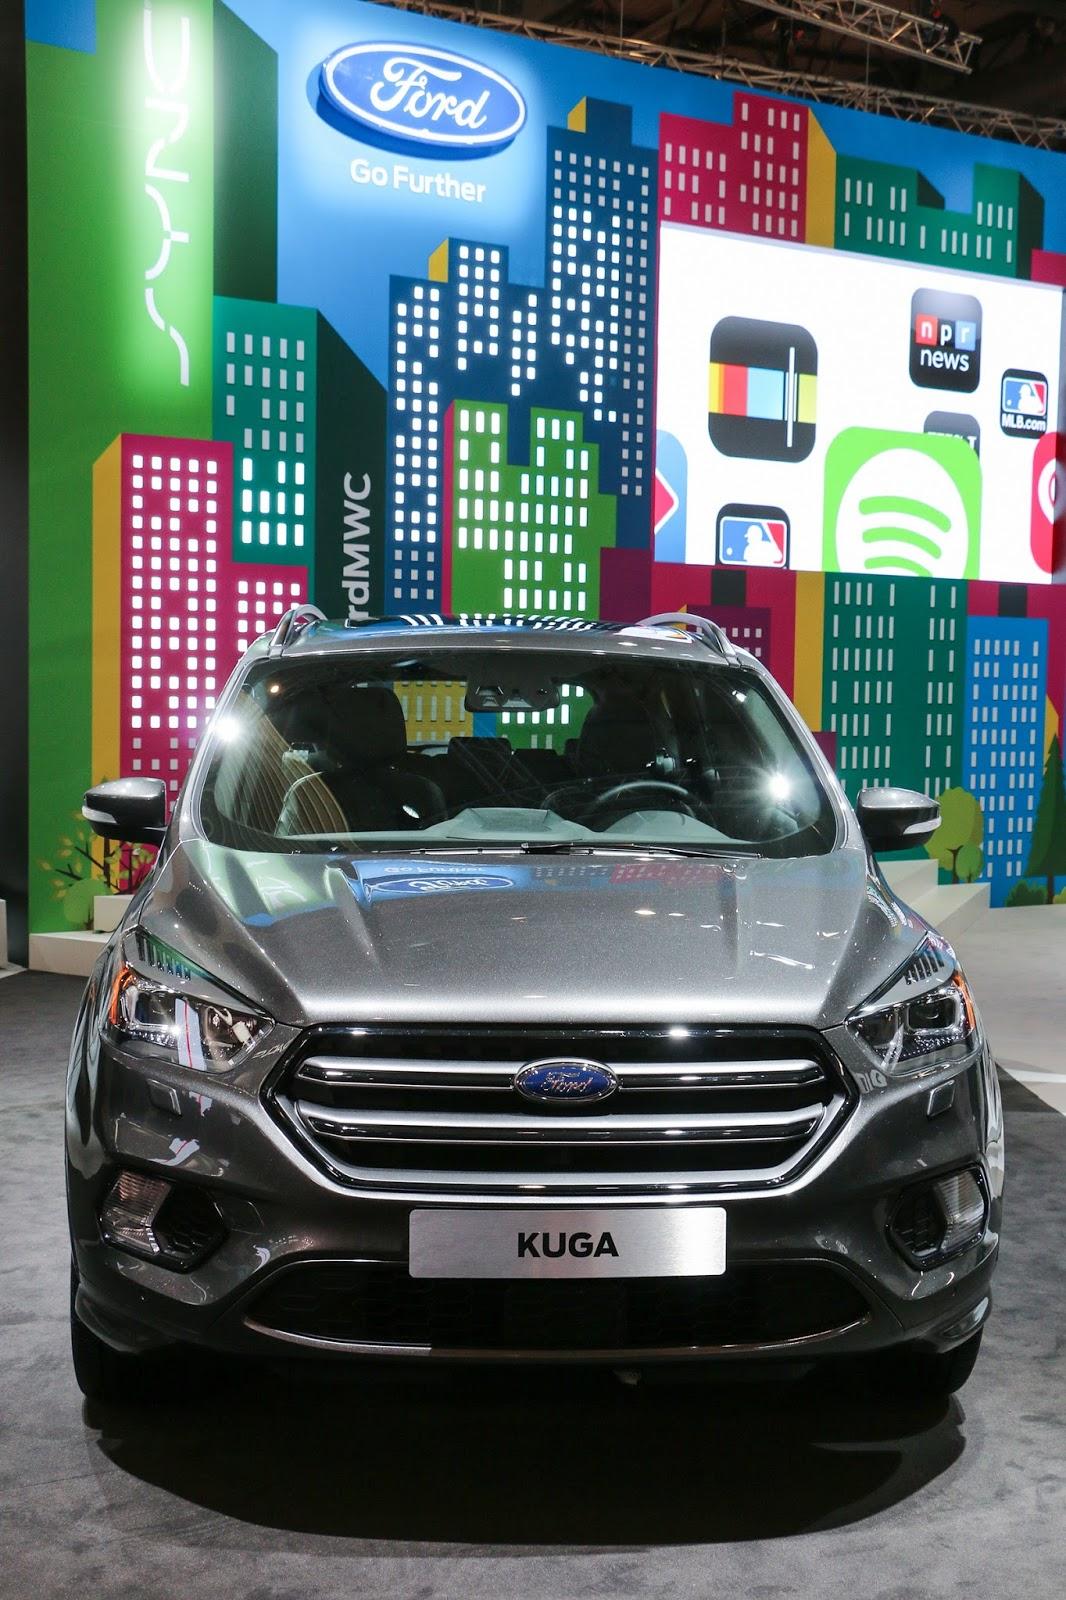 Image Result For Ford Kuga Burning